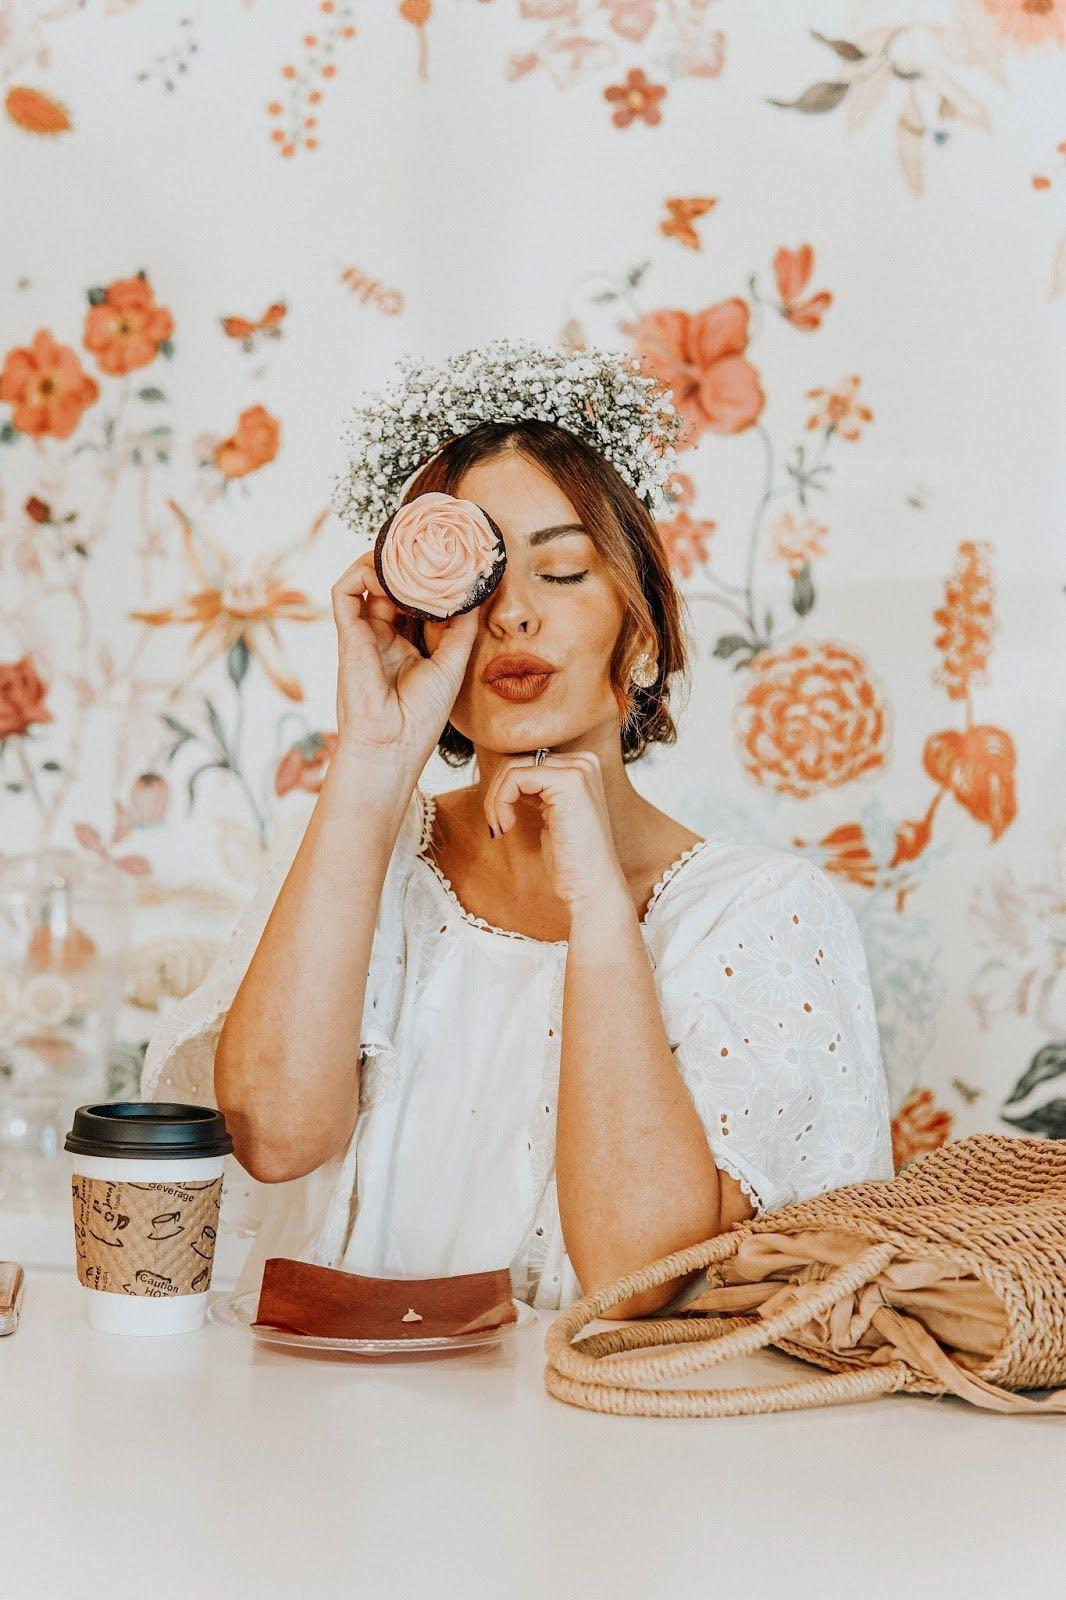 Cute Coffee Shop Photo by Fashion Blogger Emily.jpg